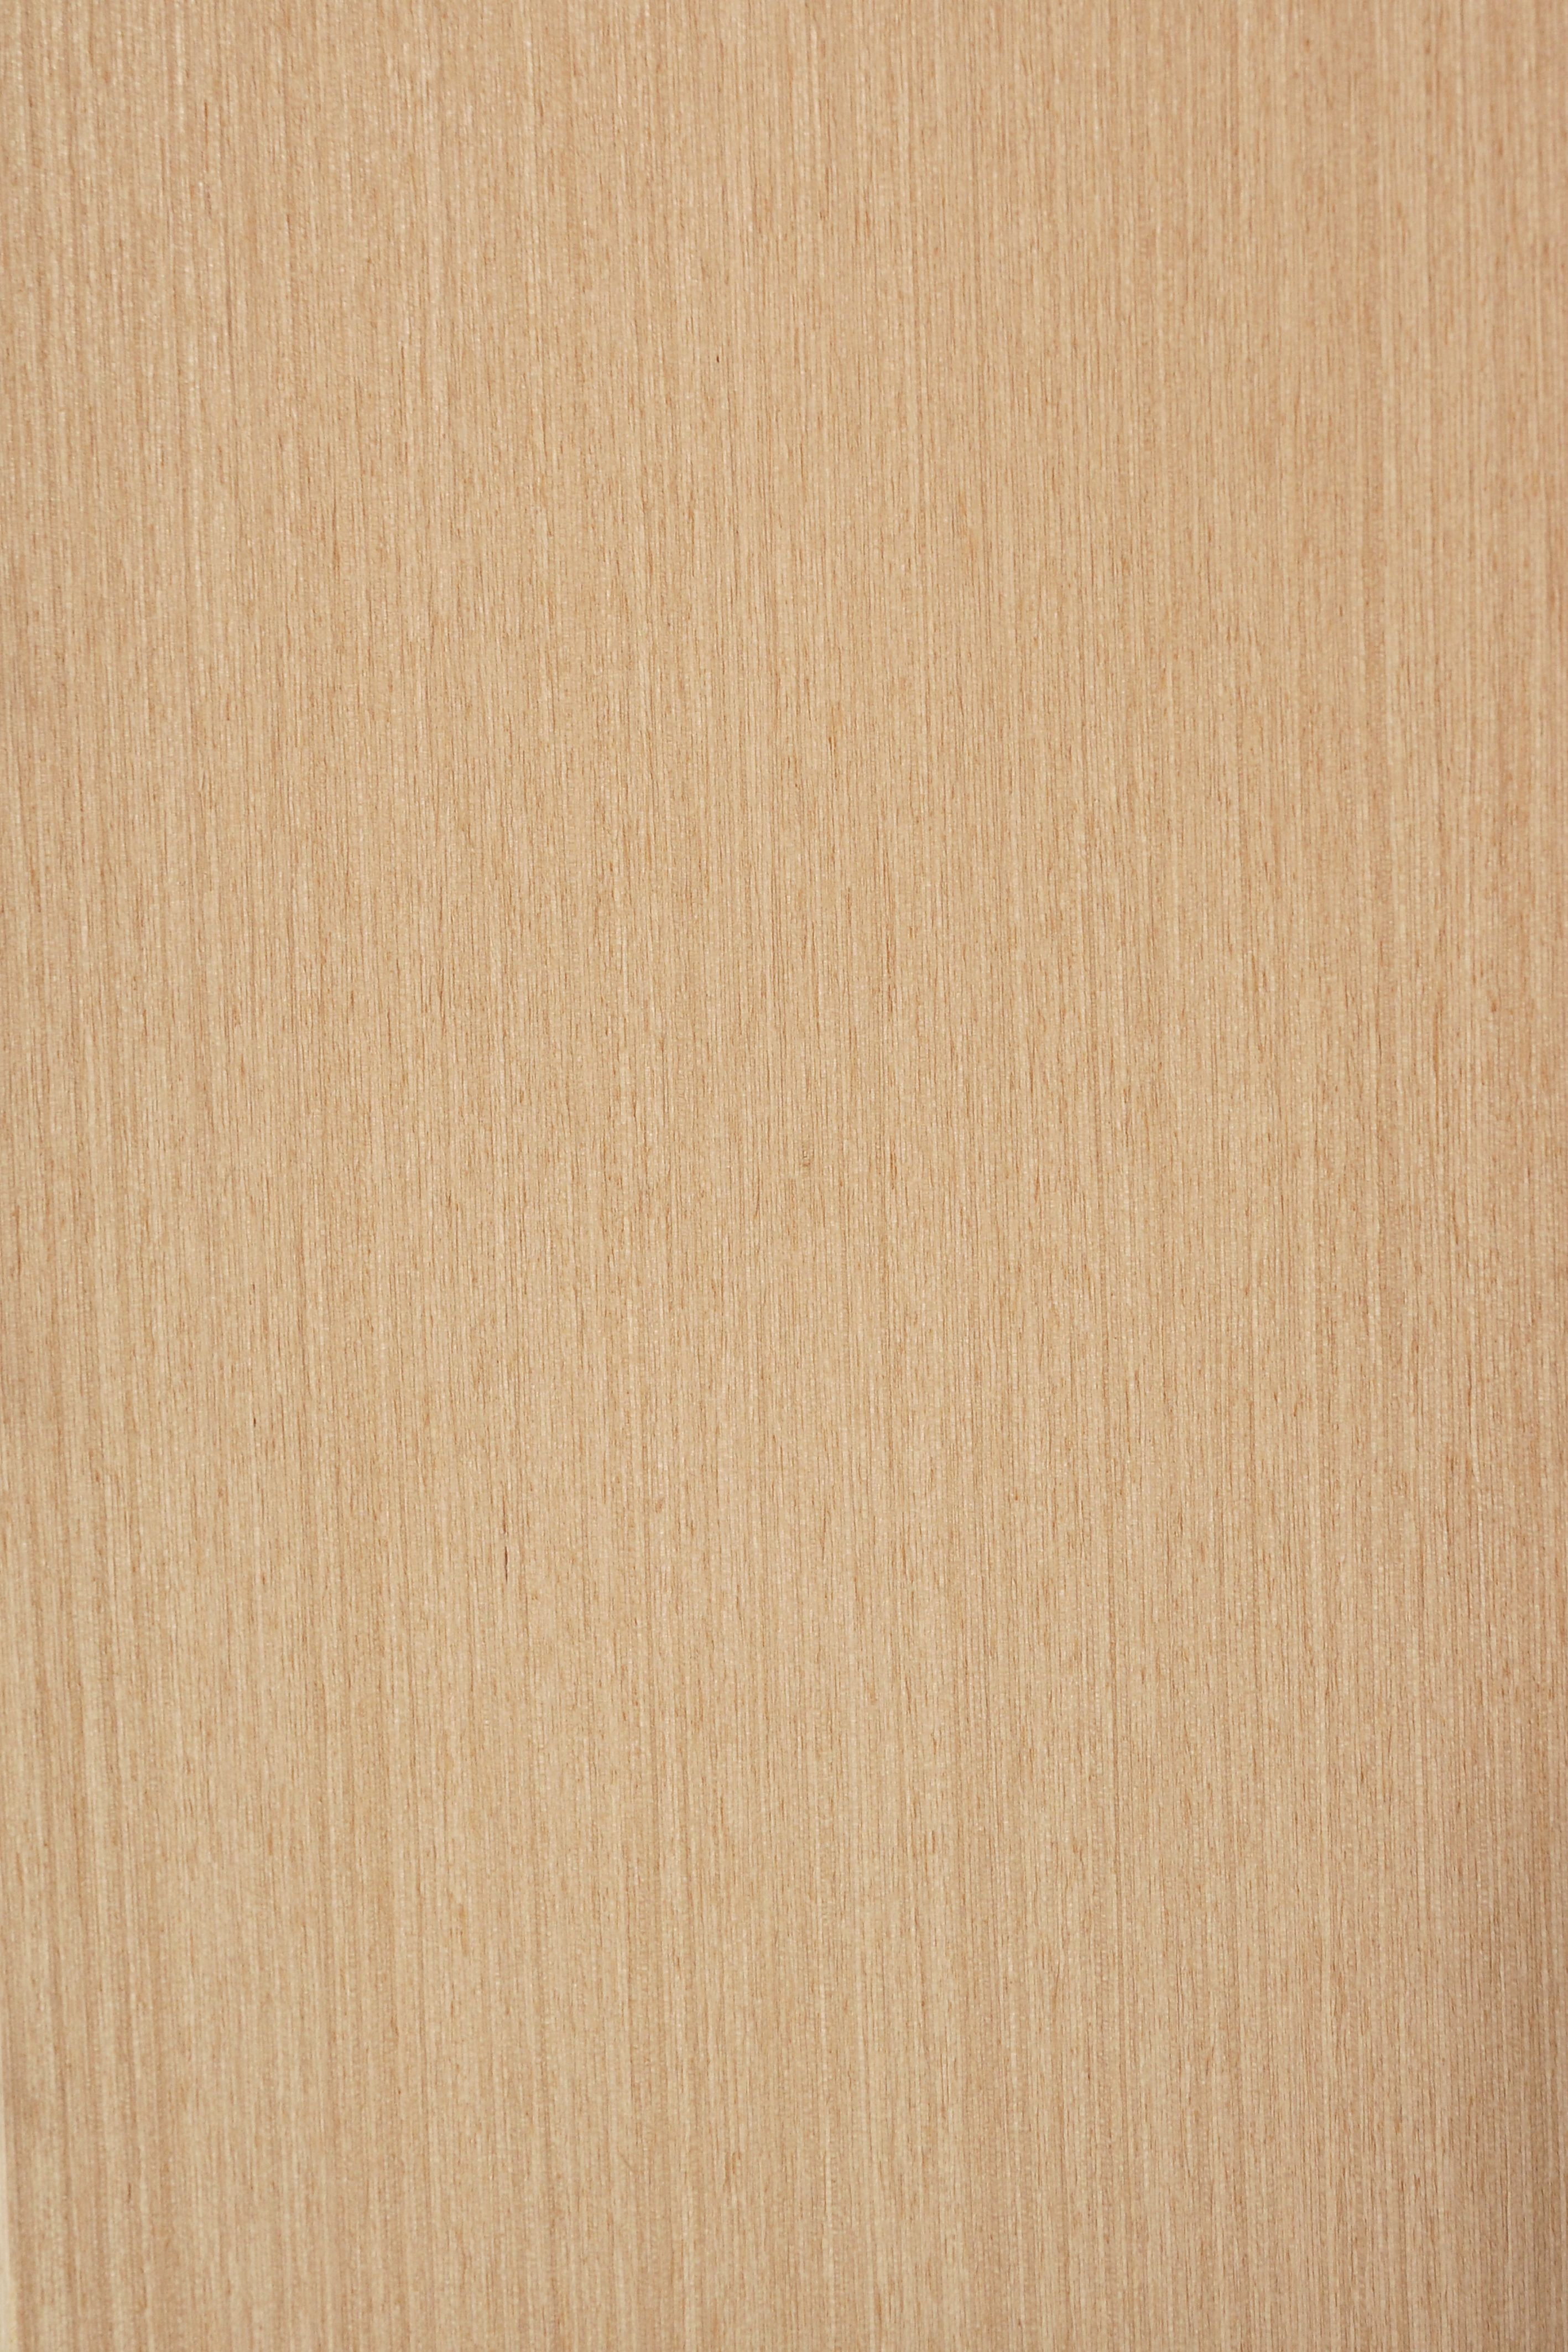 Blonde Ash Timber Veneer Colour Range Drapery Fabric Drapery